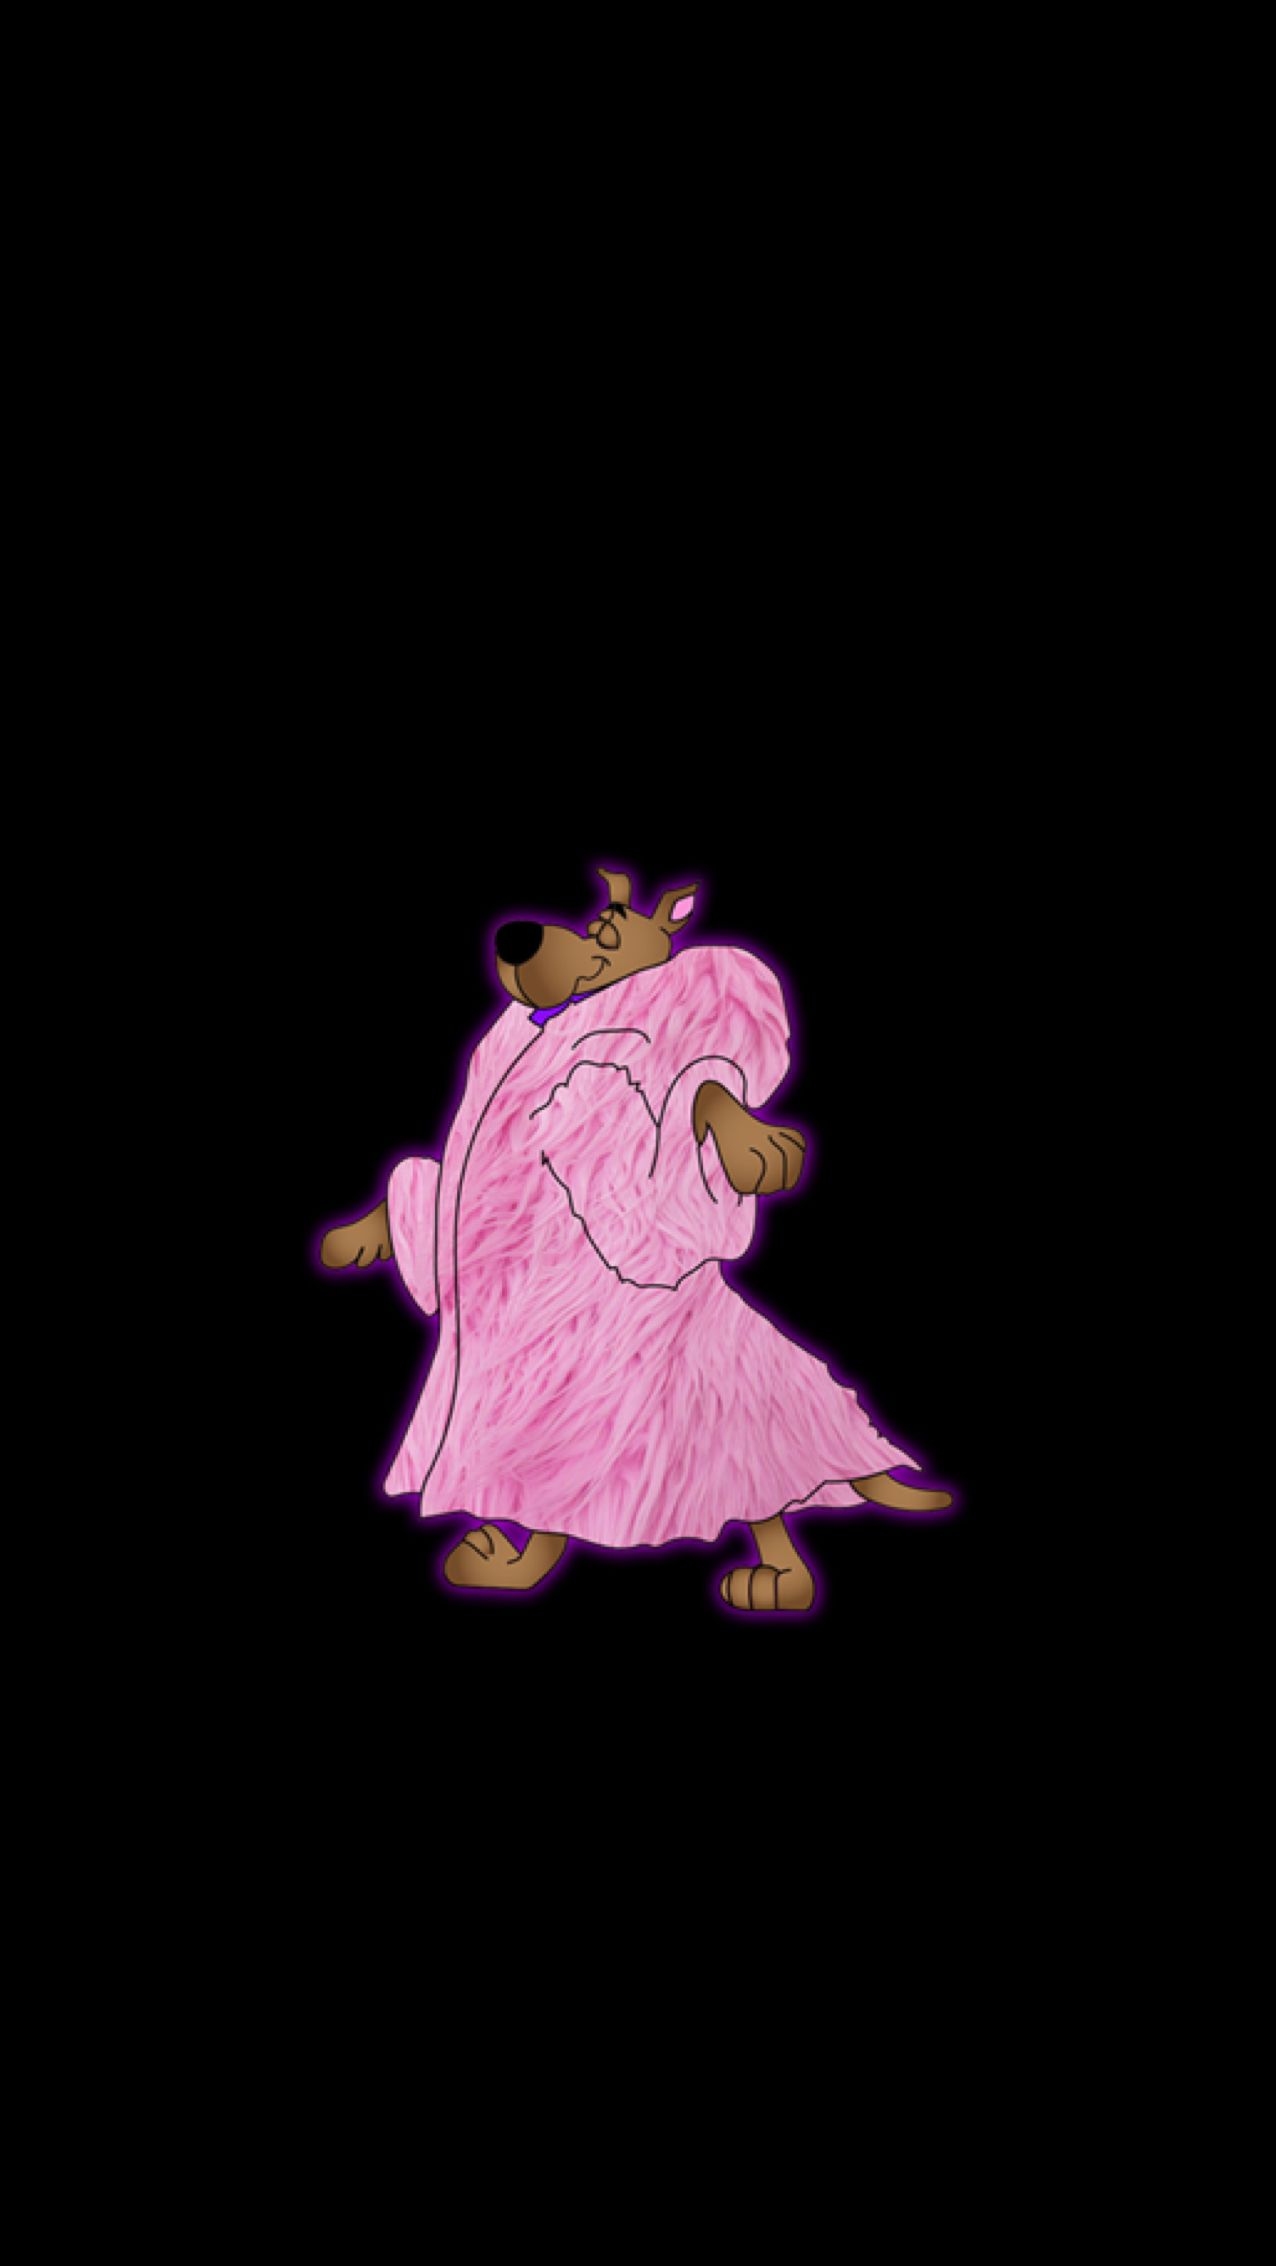 Scooby Doo Wallpaper Hd Phone Illustration 2066571 Hd